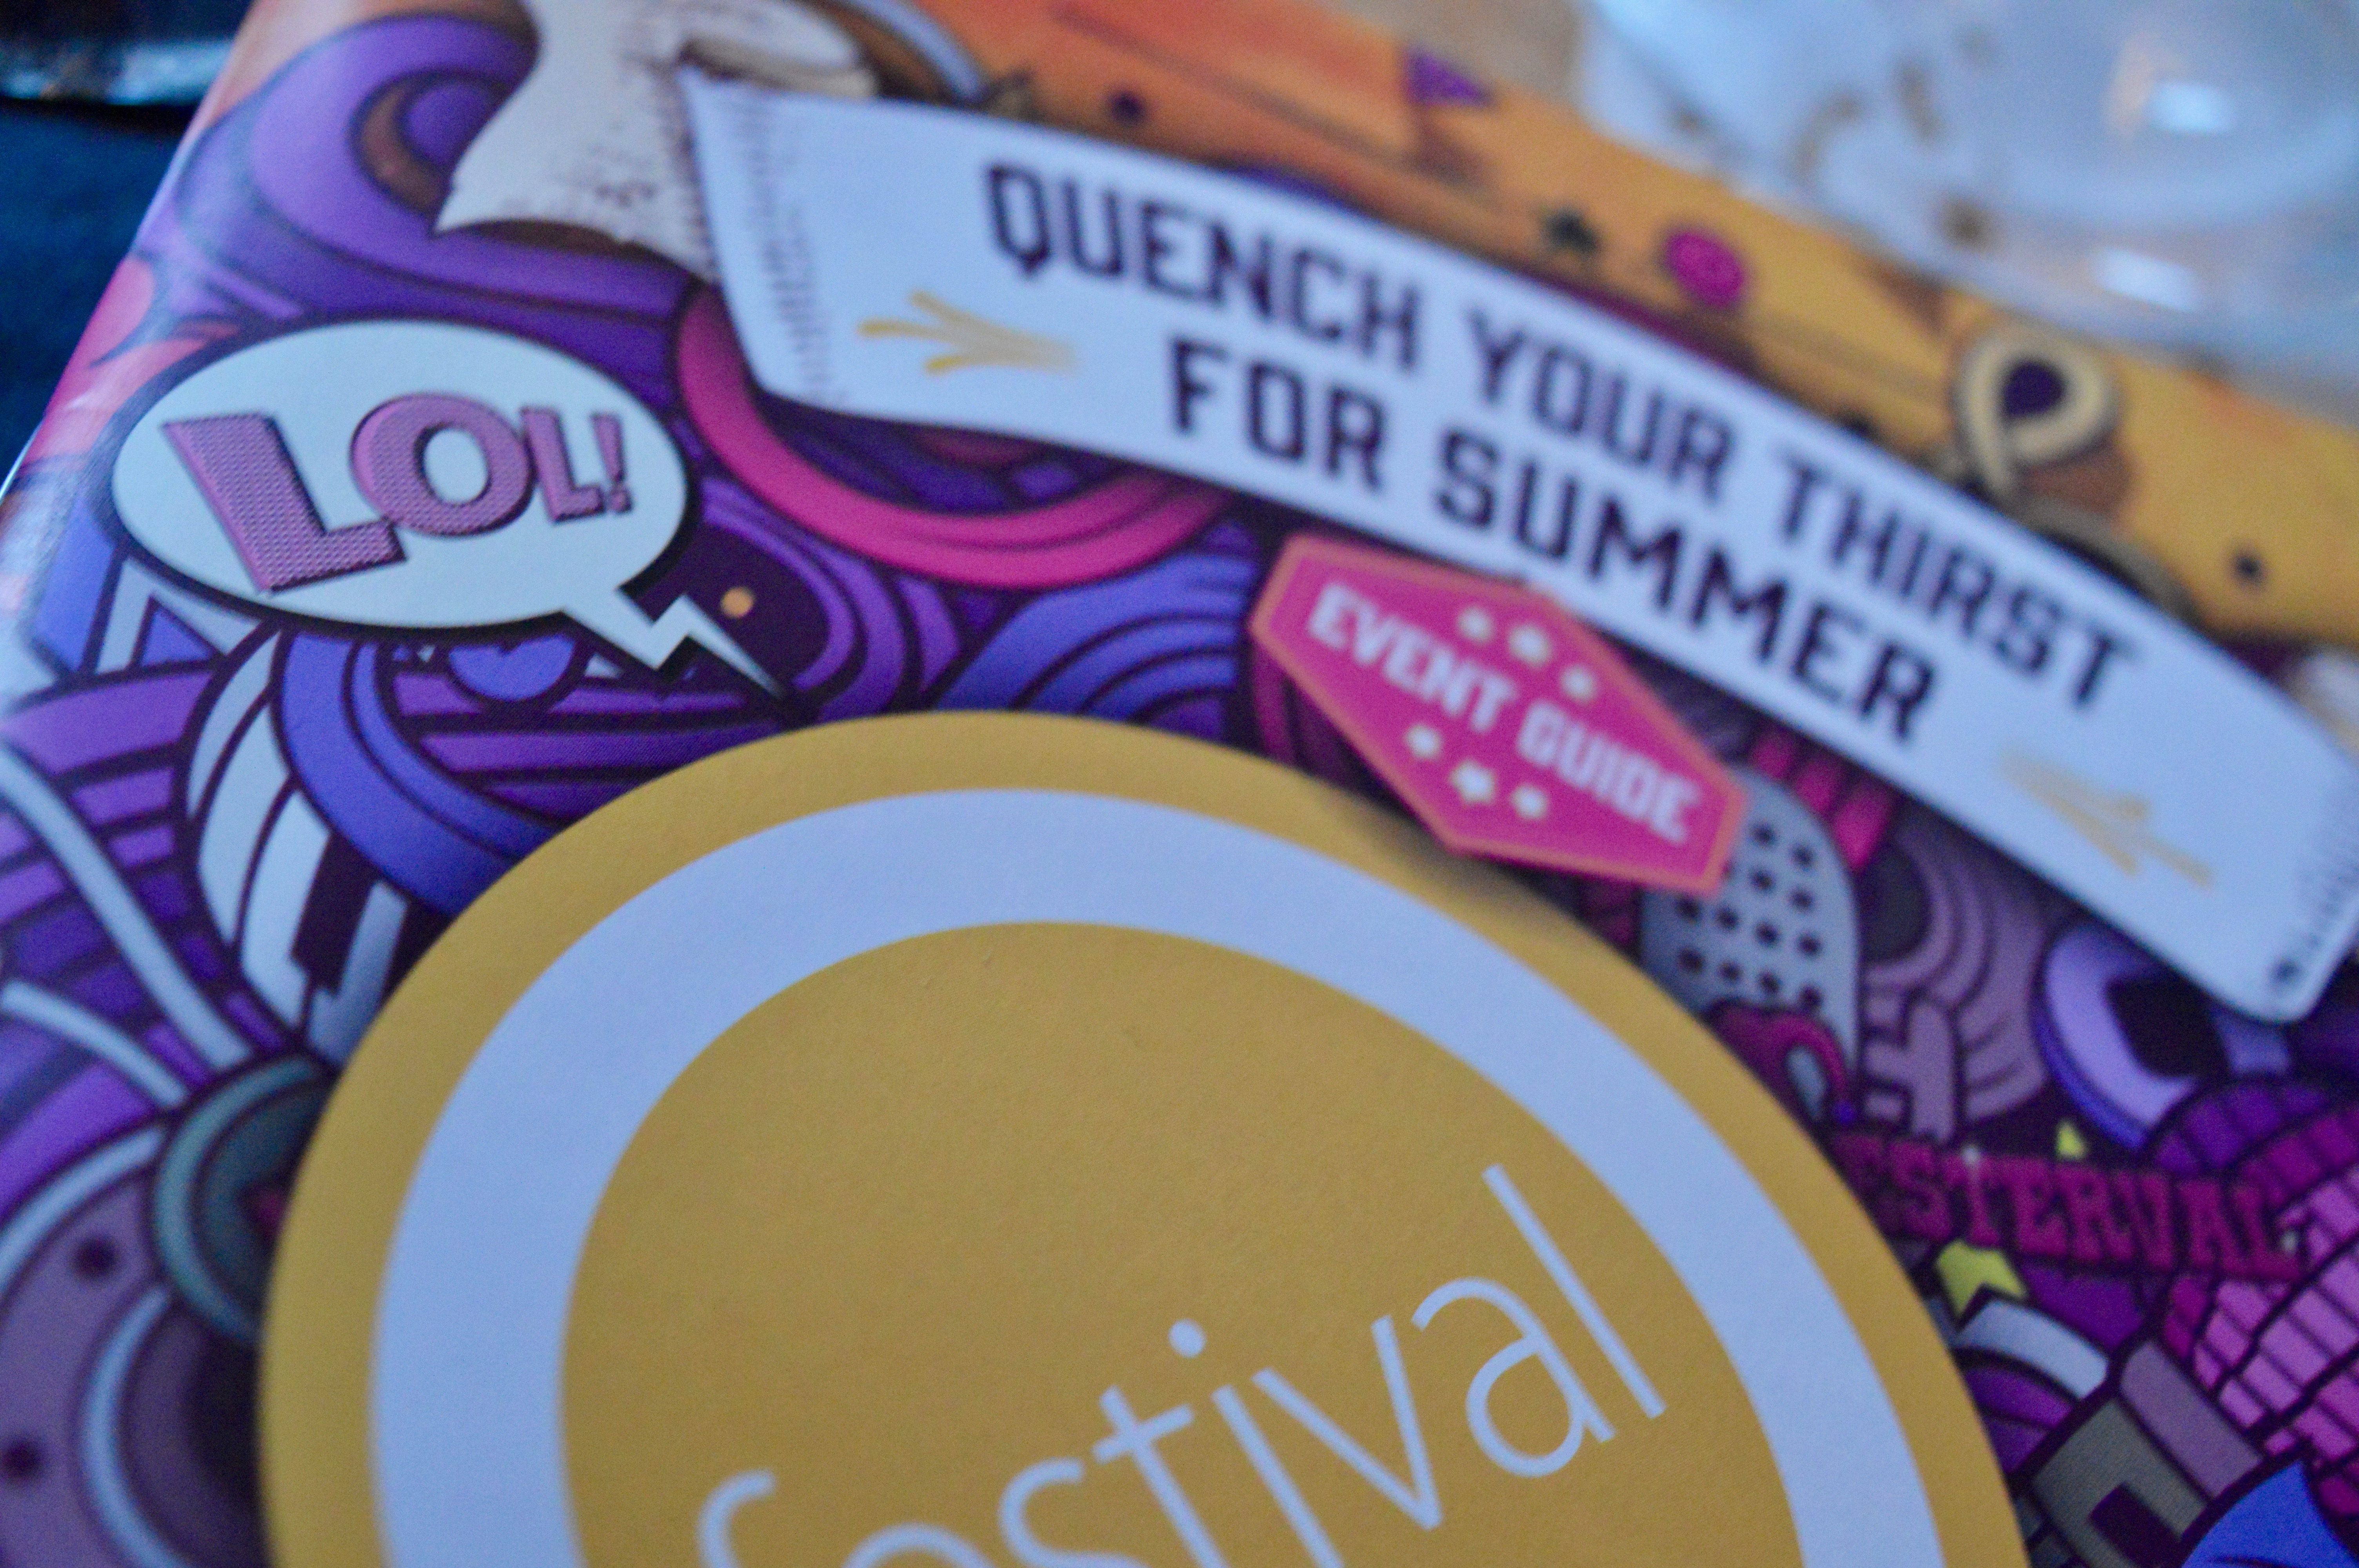 Q Festival Gateshead Programme Elle Blonde Luxury Lifestyle Blog